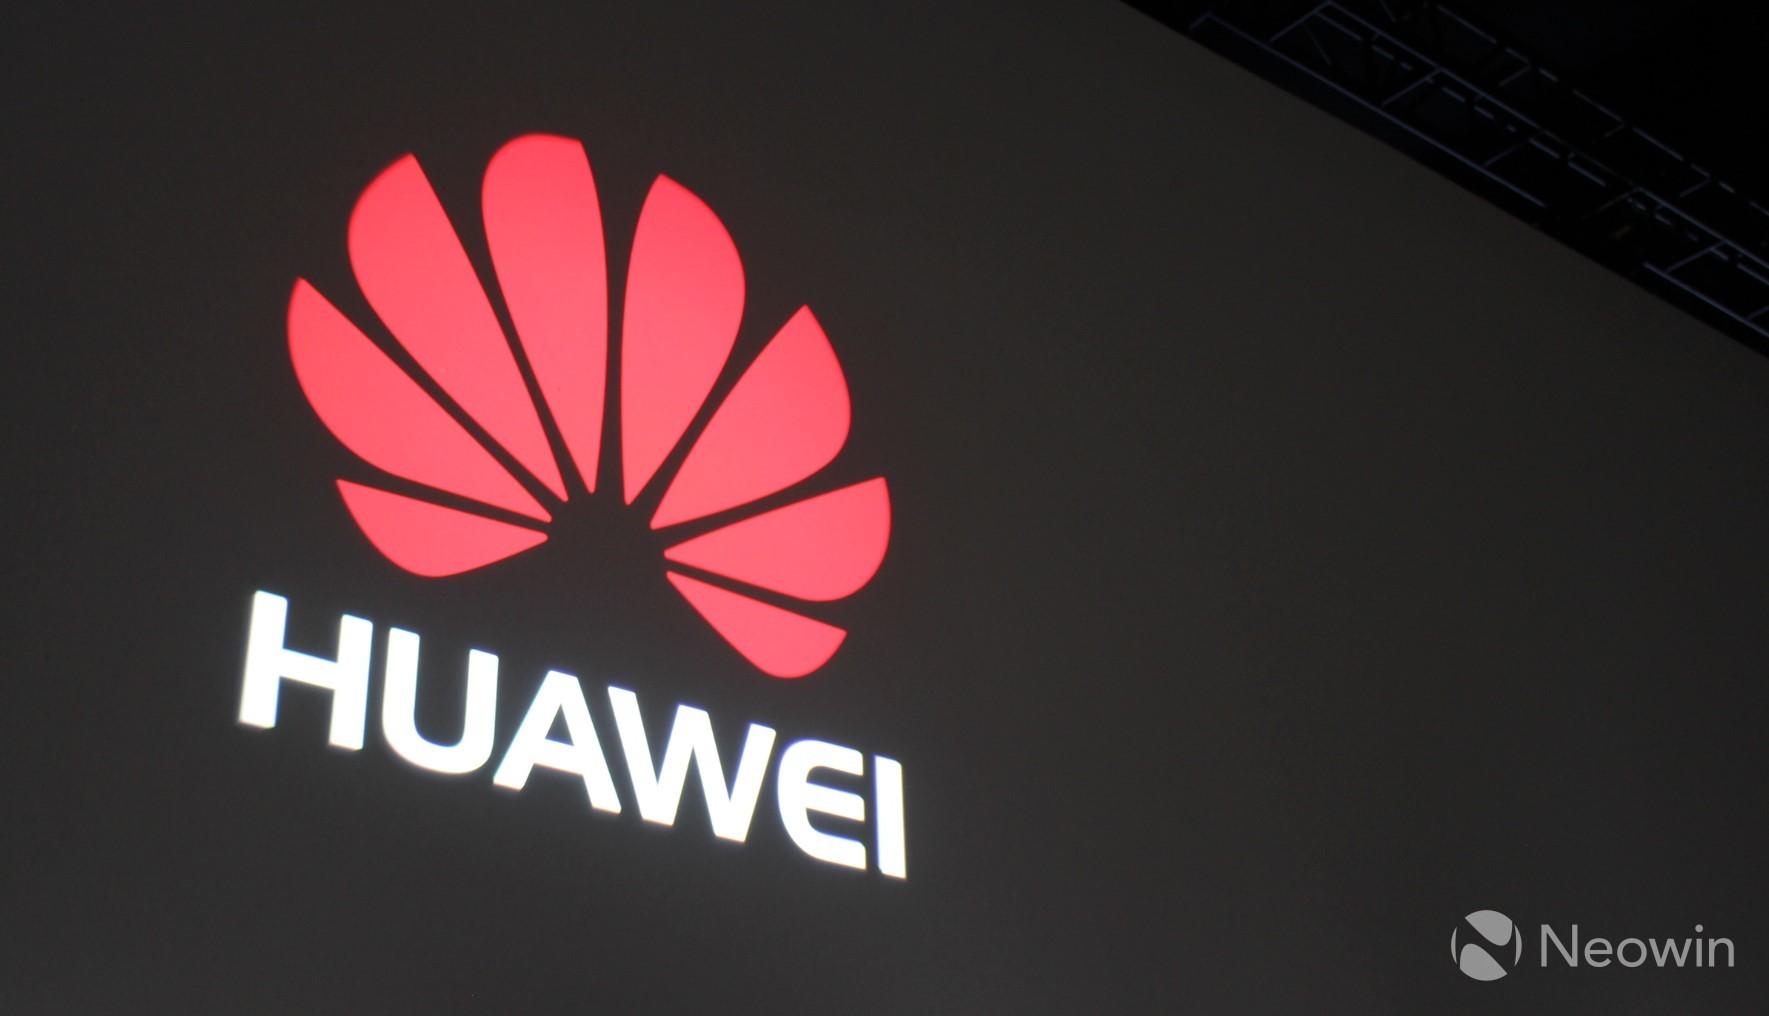 Huawei pledges $2 billion to address UK security fears - Neowin